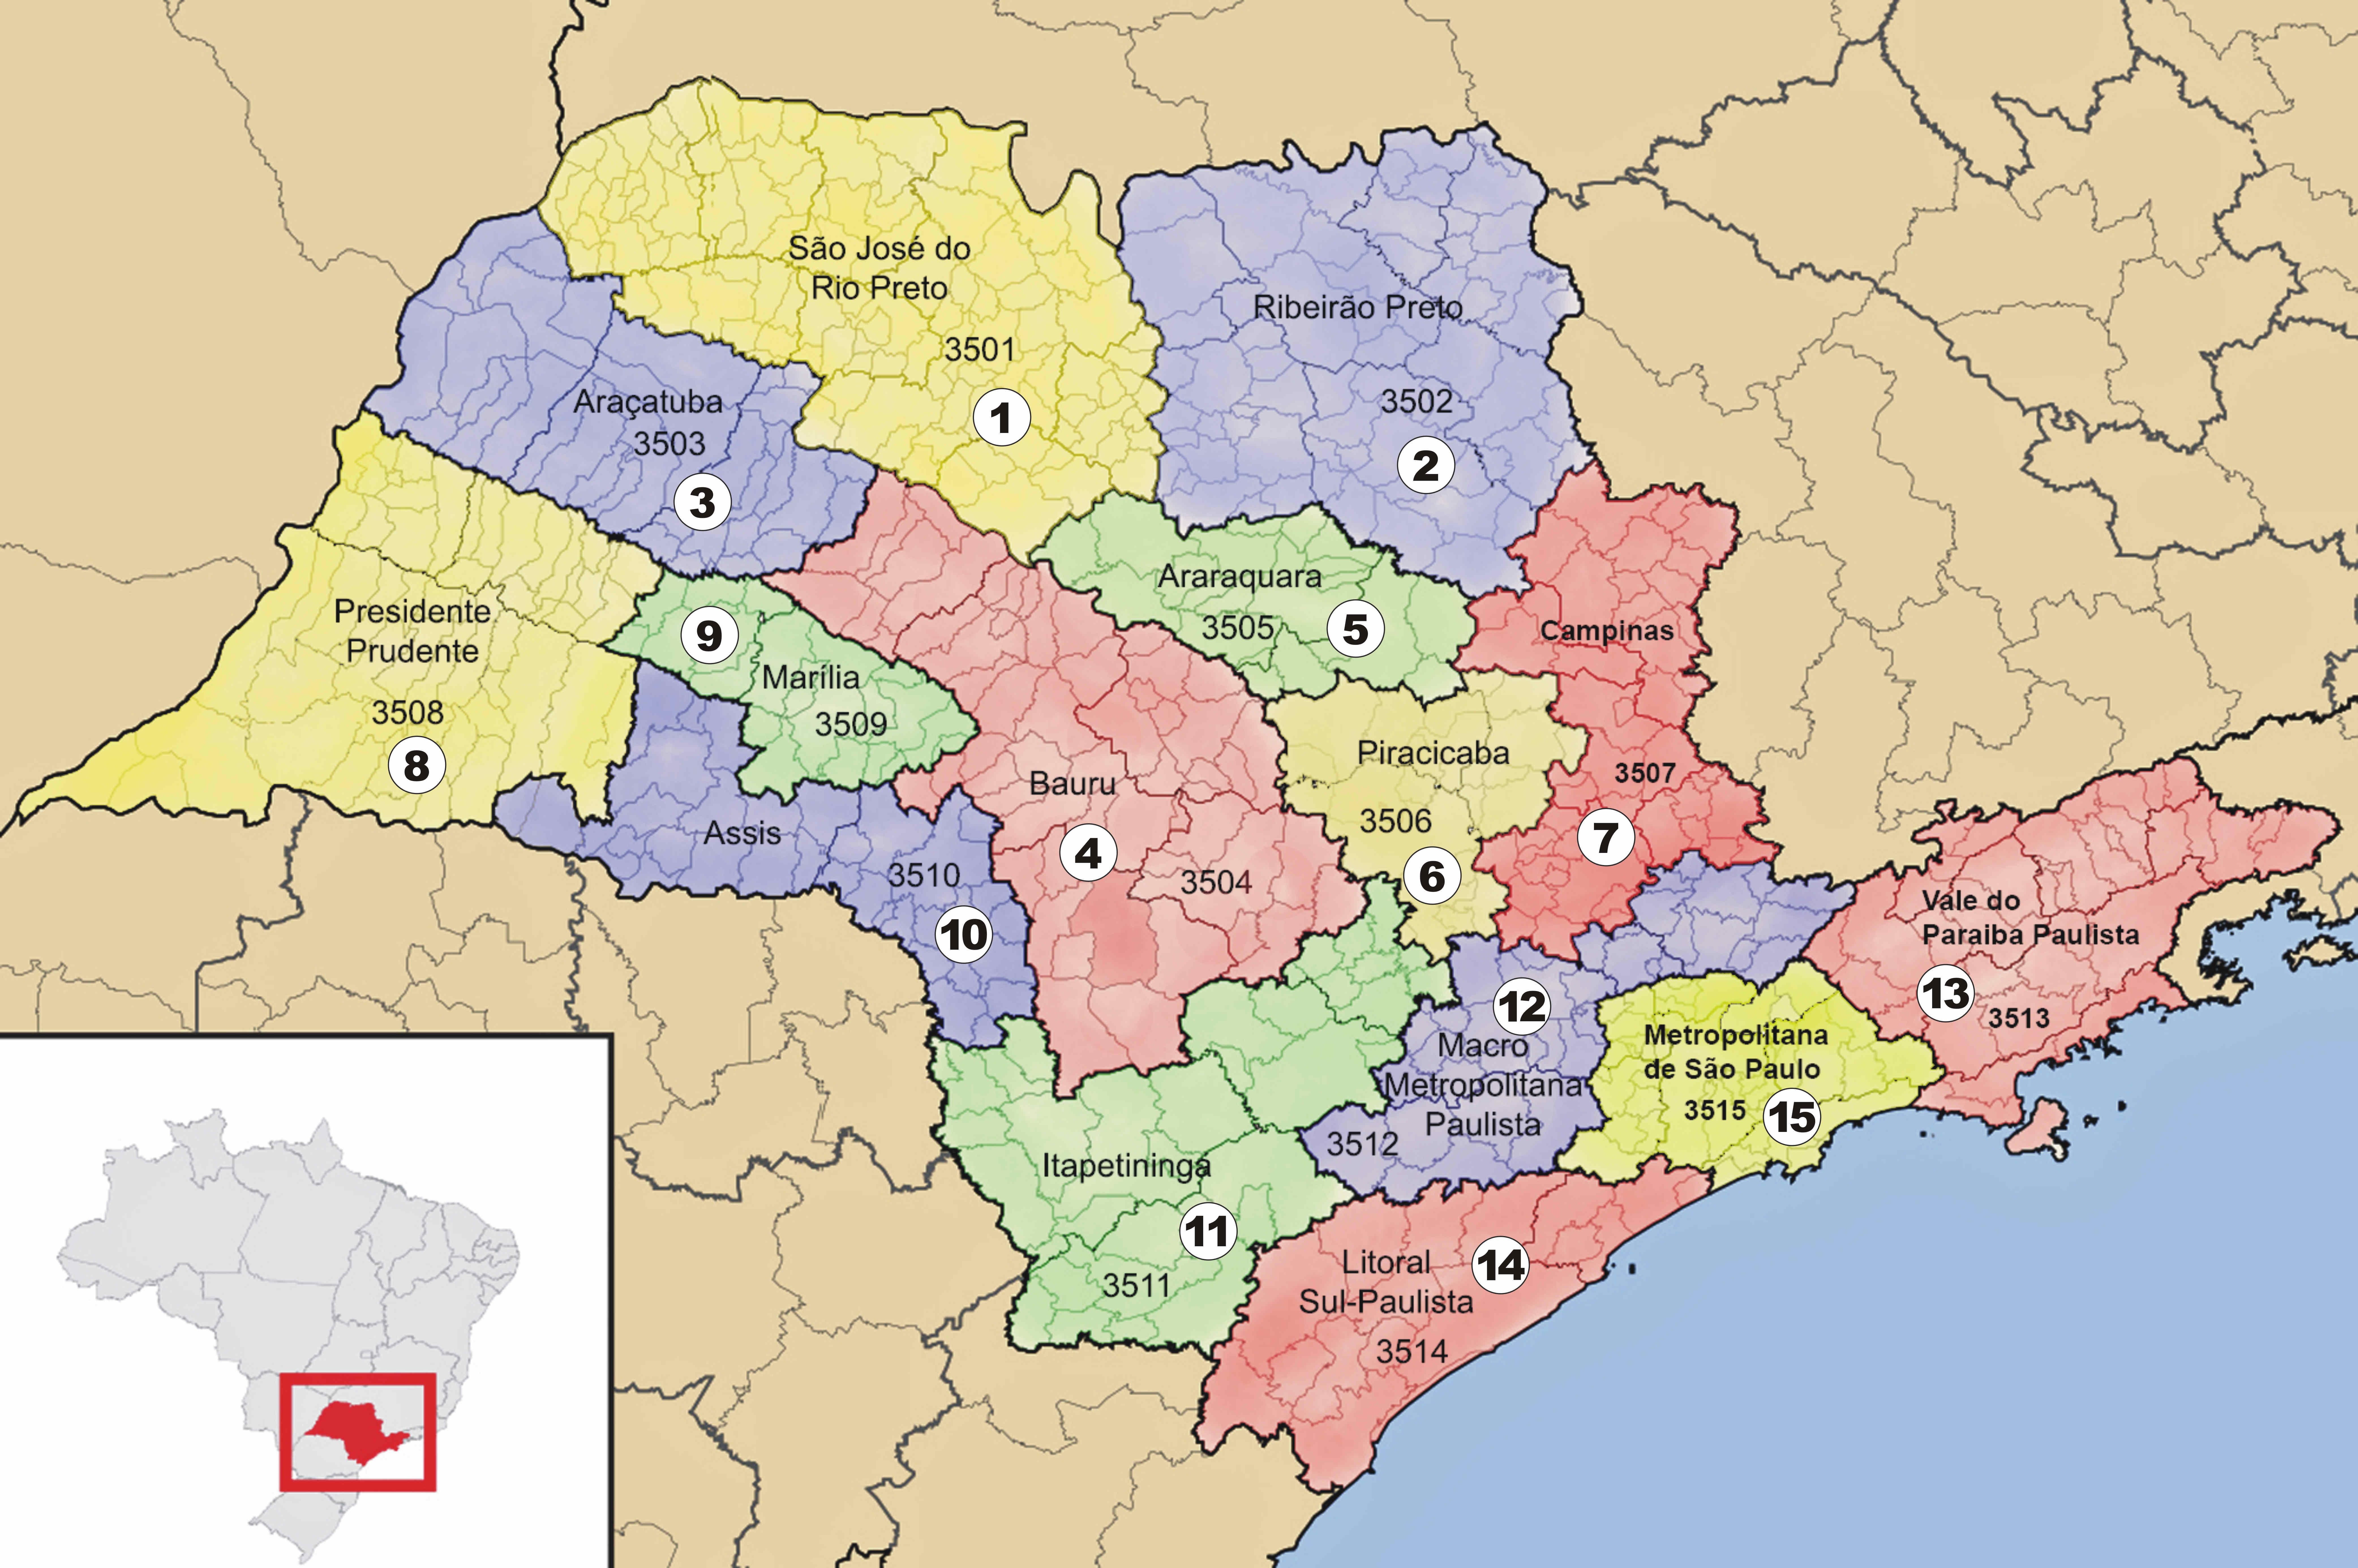 Subdivisions of São Paulo (state) - Wikipedia on parque do ibirapuera, rio de janeiro map, buenos aires map, recife map, viracopos international airport, moscow map, rio de janeiro, johannesburg map, delhi map, cachoeira do sul, manila map, porto alegre, ibirapuera auditorium, brasilia map, beijing map, argentina map, brazil map, quito map, bogota on map, salvador map, tokyo map, lagos map, chapada diamantina national park, sao francisco river map, lima map, singapore map, caracas map,